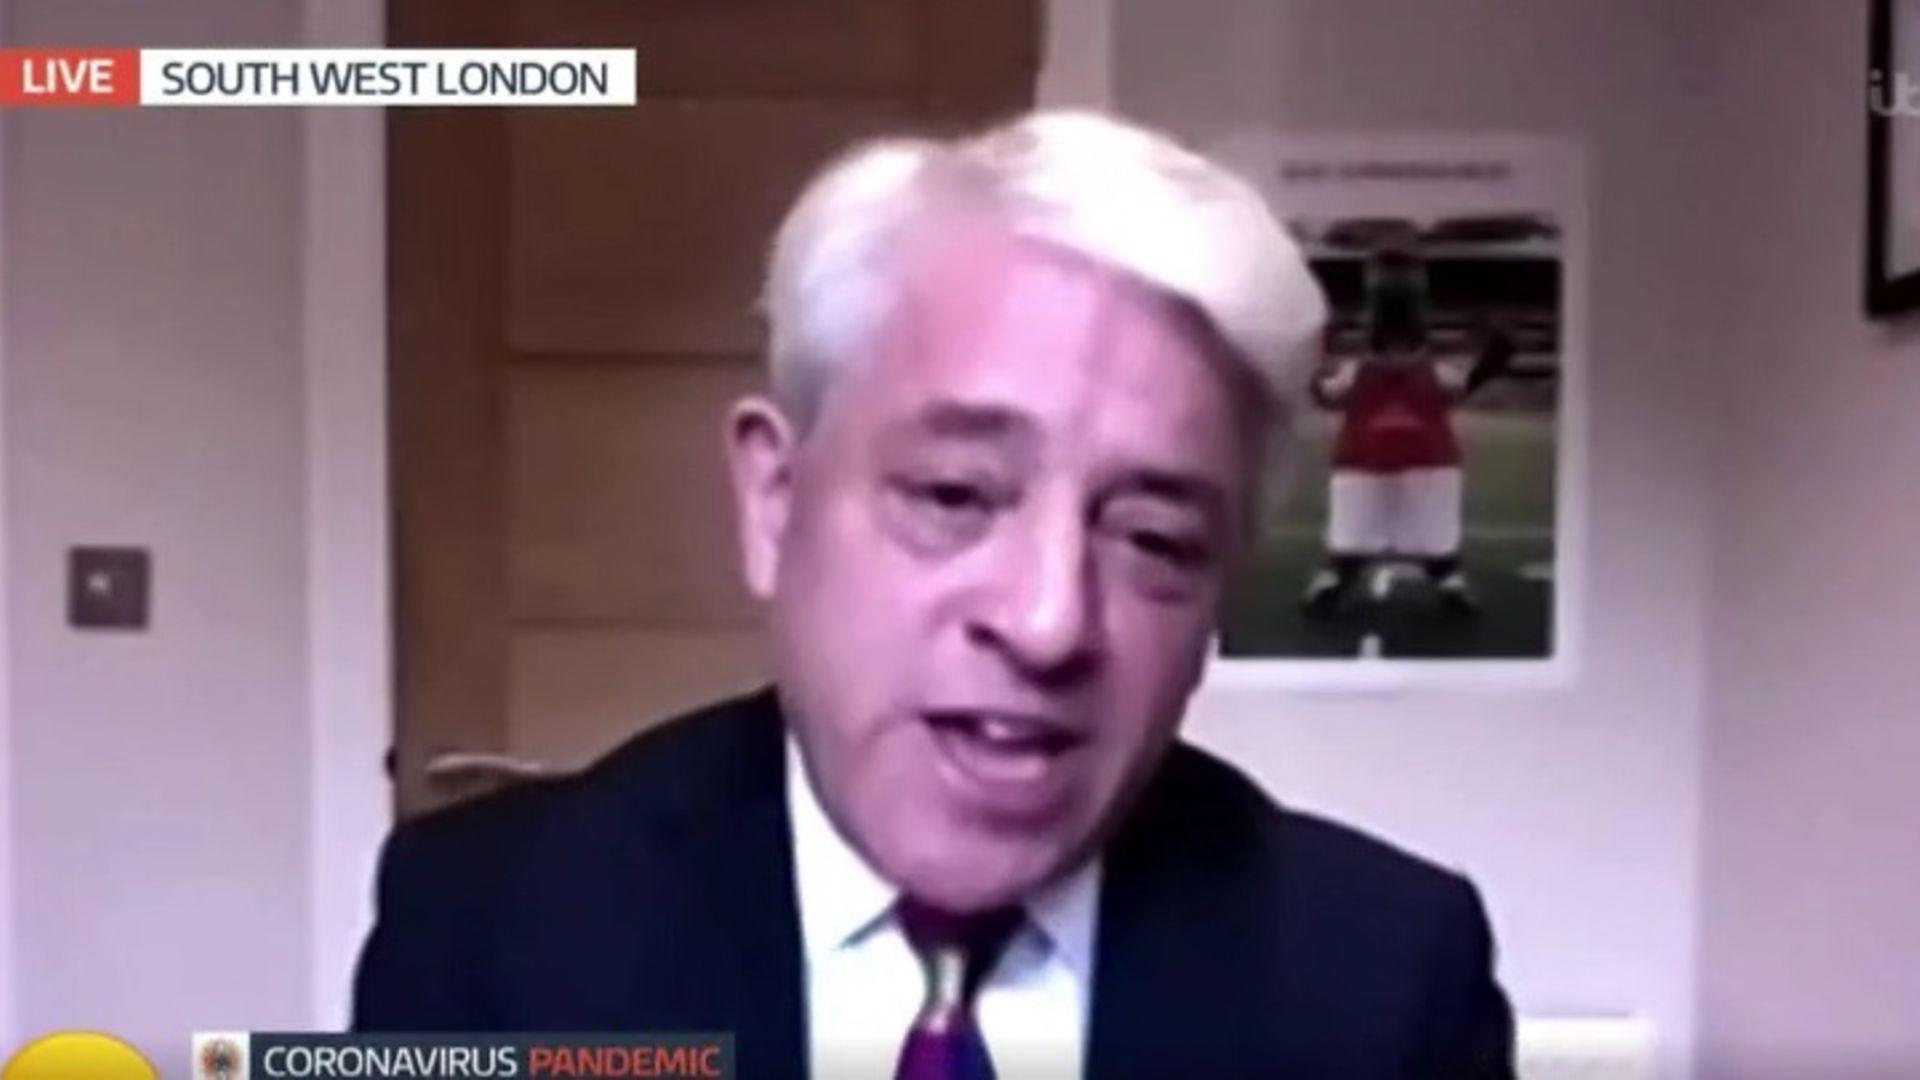 John Bercow appears on Good Morning Britain - Credit: ITV